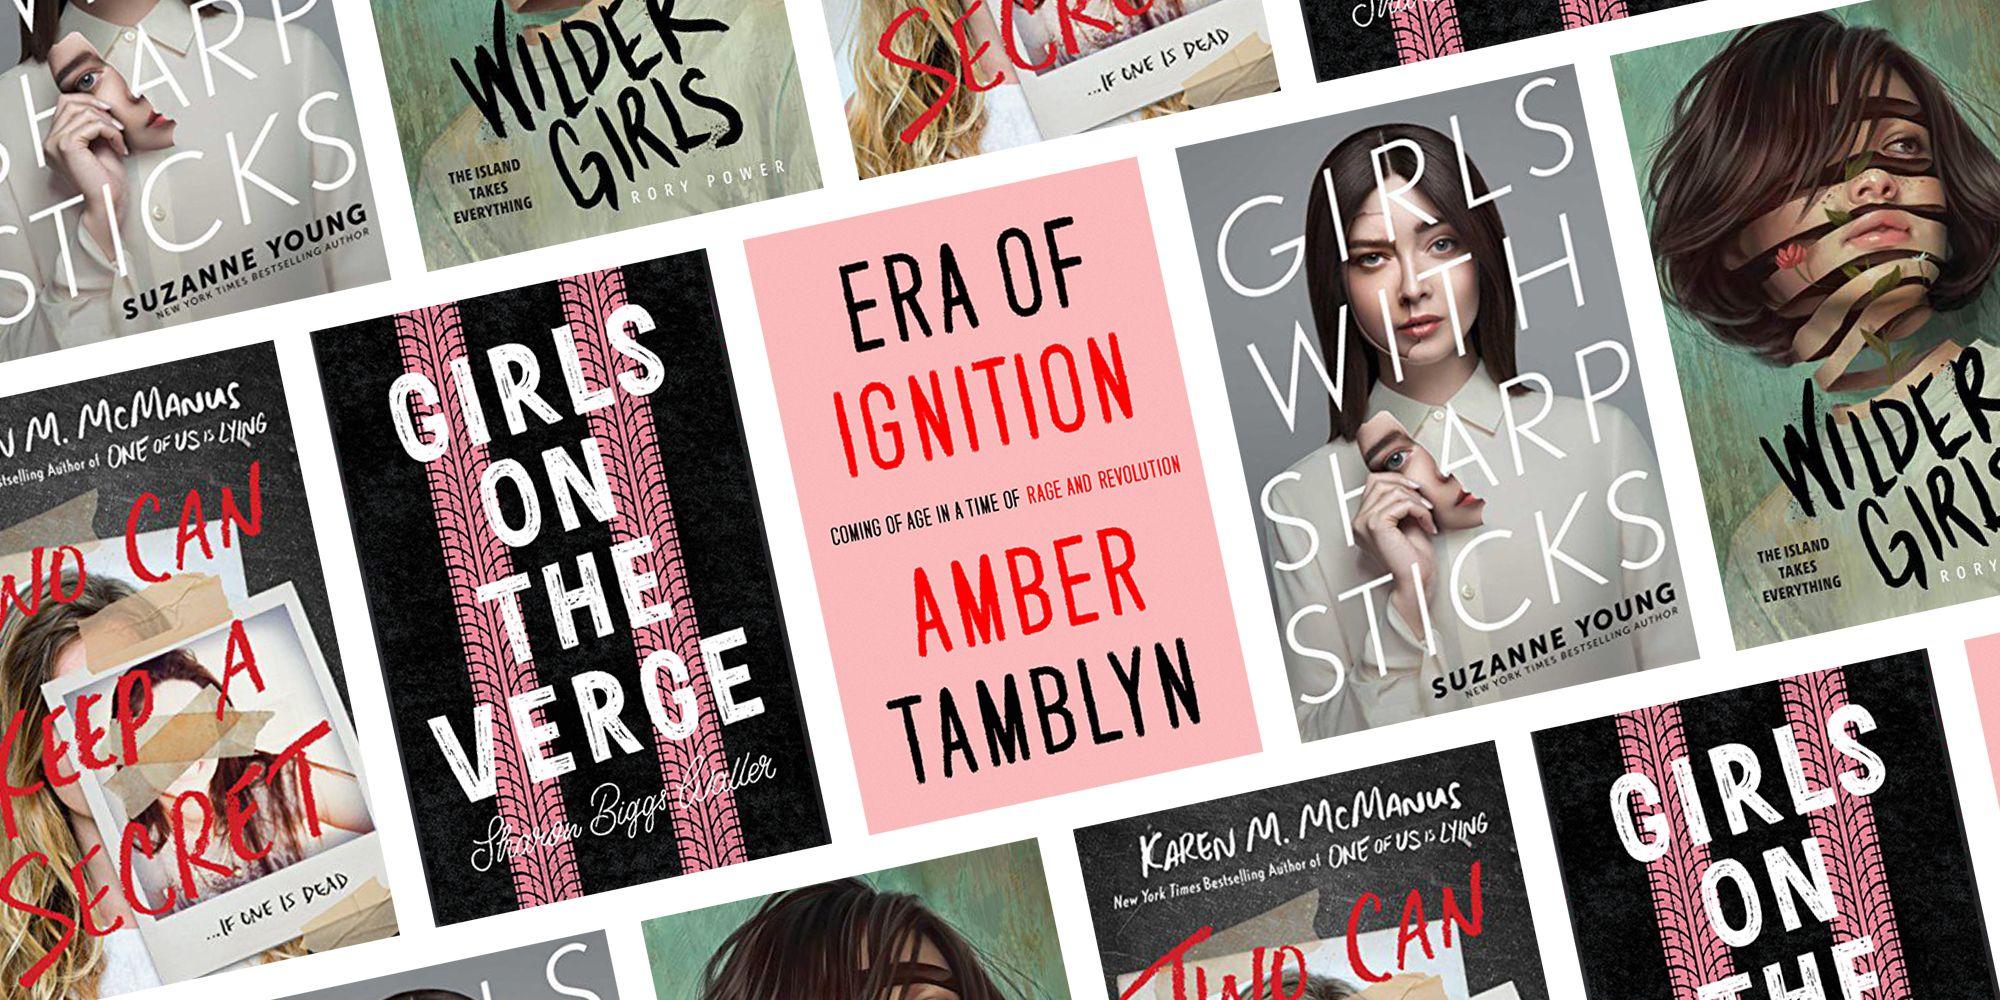 dating advice for women books 2016 for women 2017